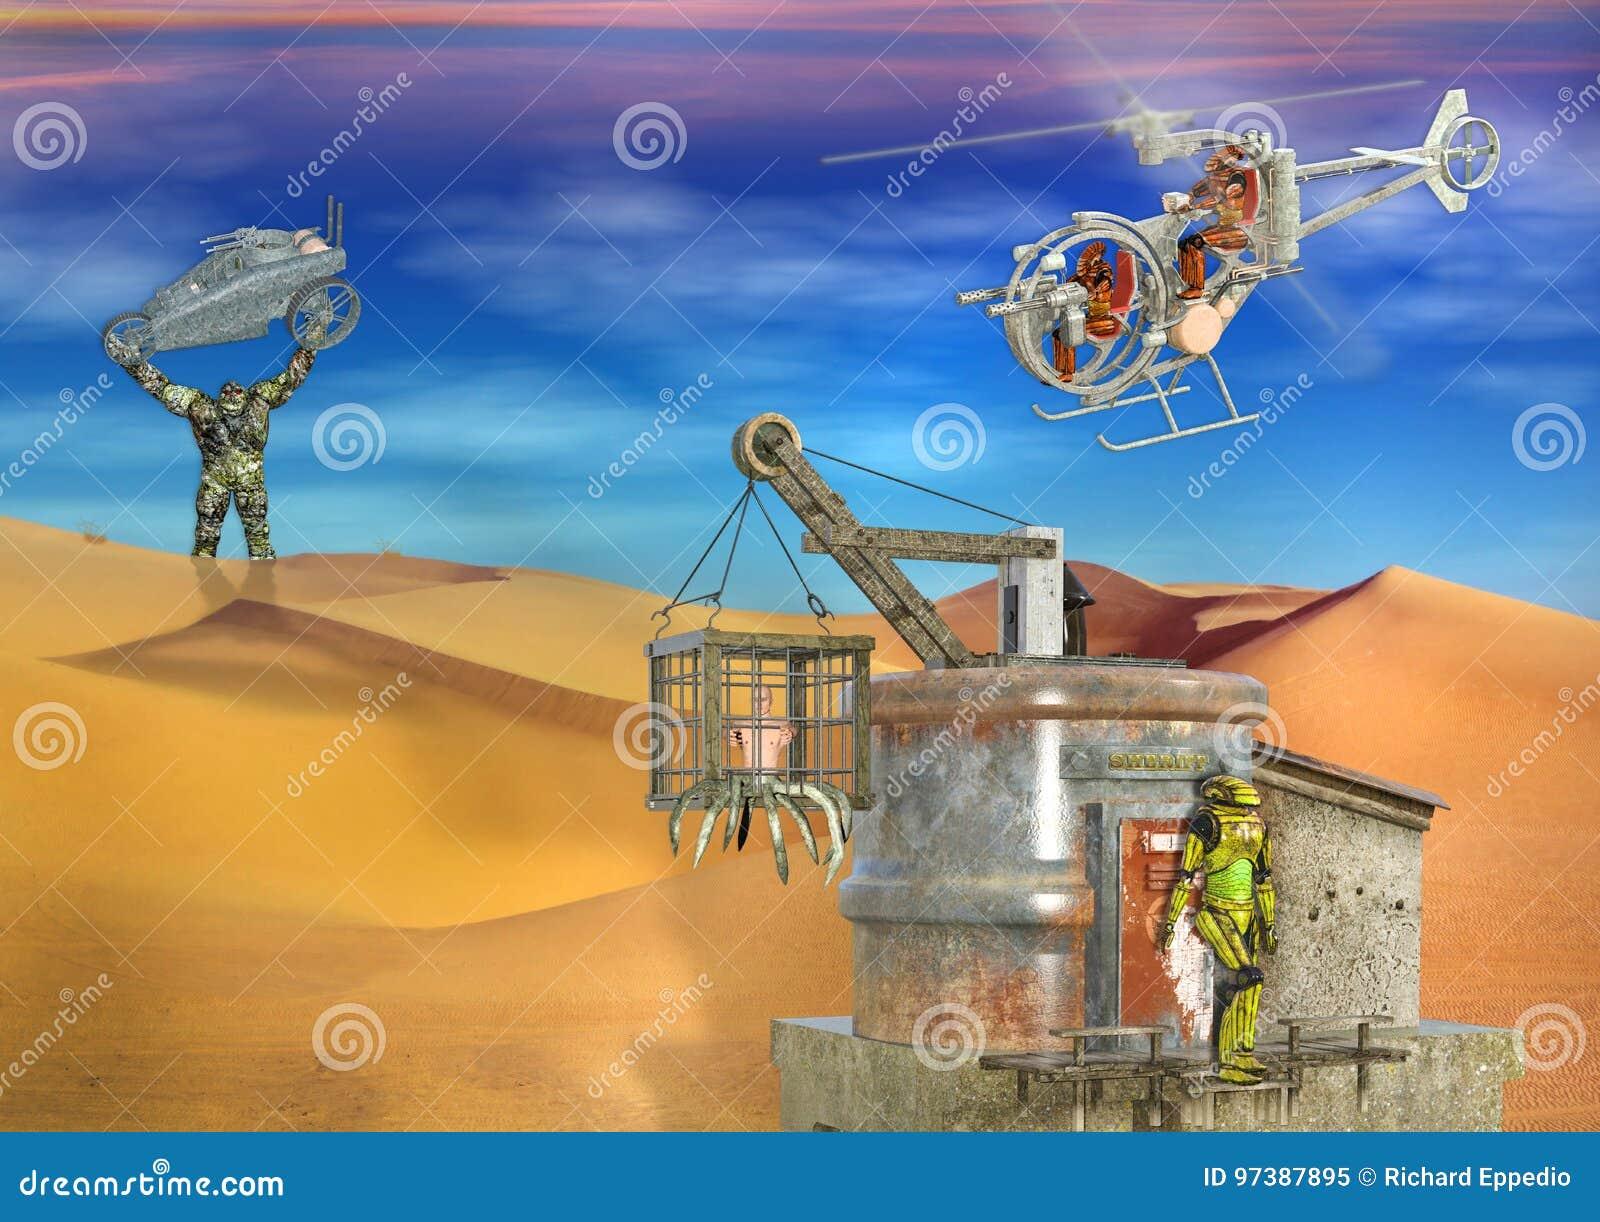 Escena dystopian futurista surrealista del desierto 3D